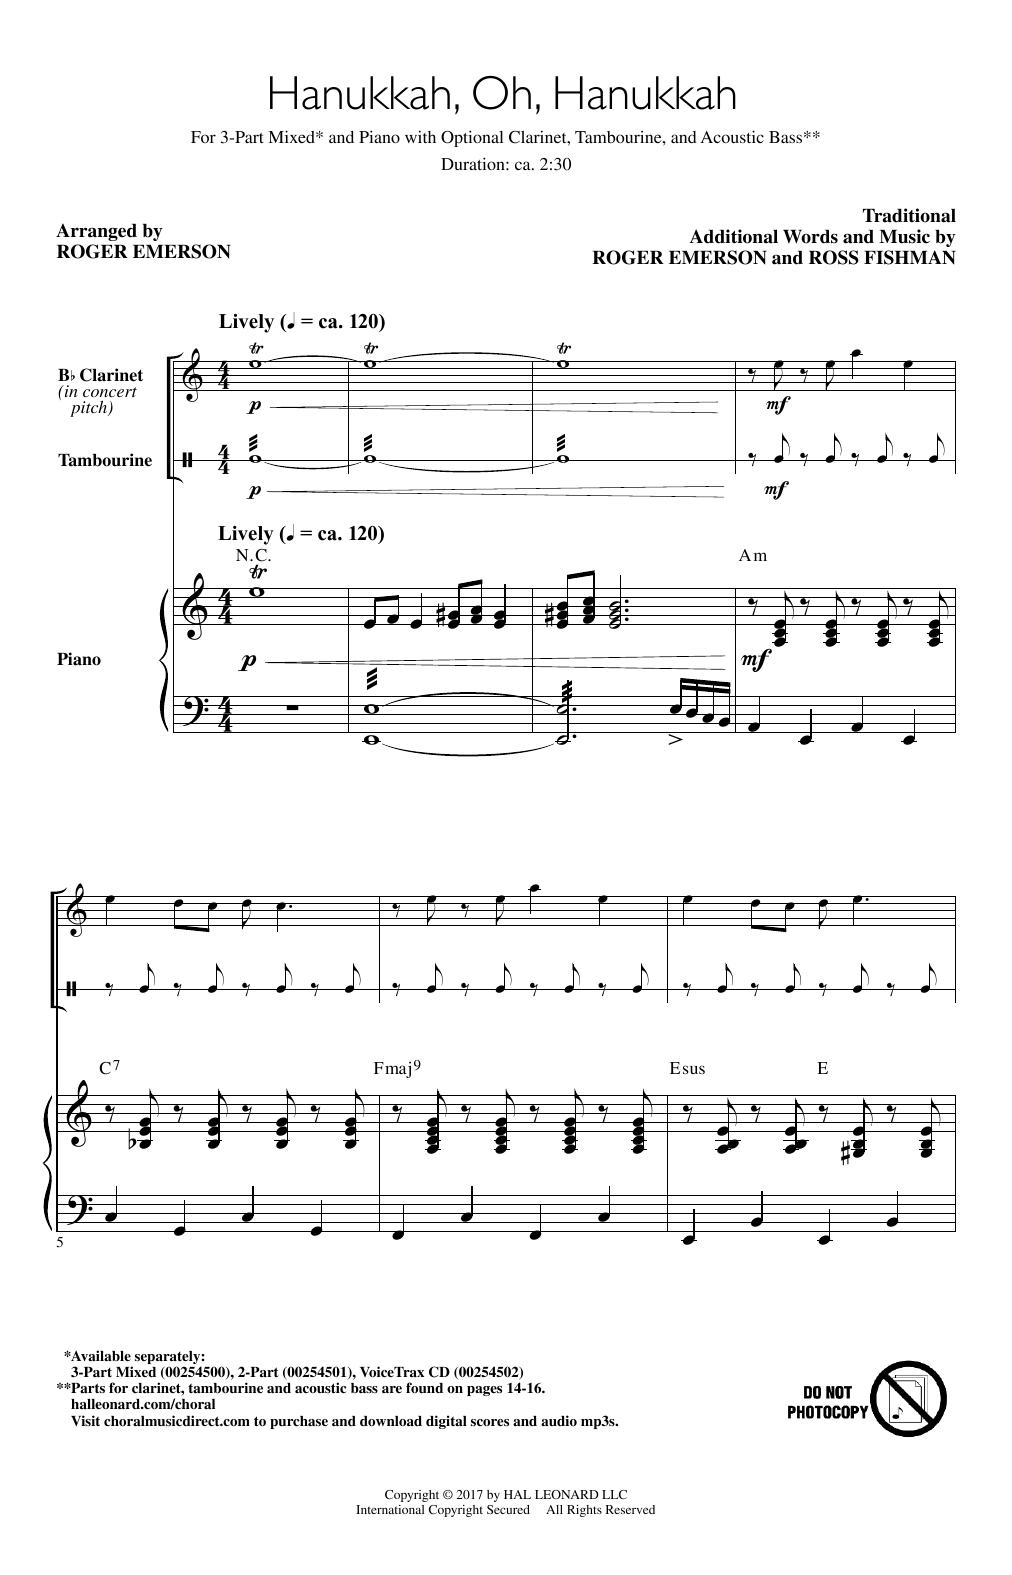 Roger Emerson Hanukkah, Oh, Hanukkah sheet music notes and chords. Download Printable PDF.